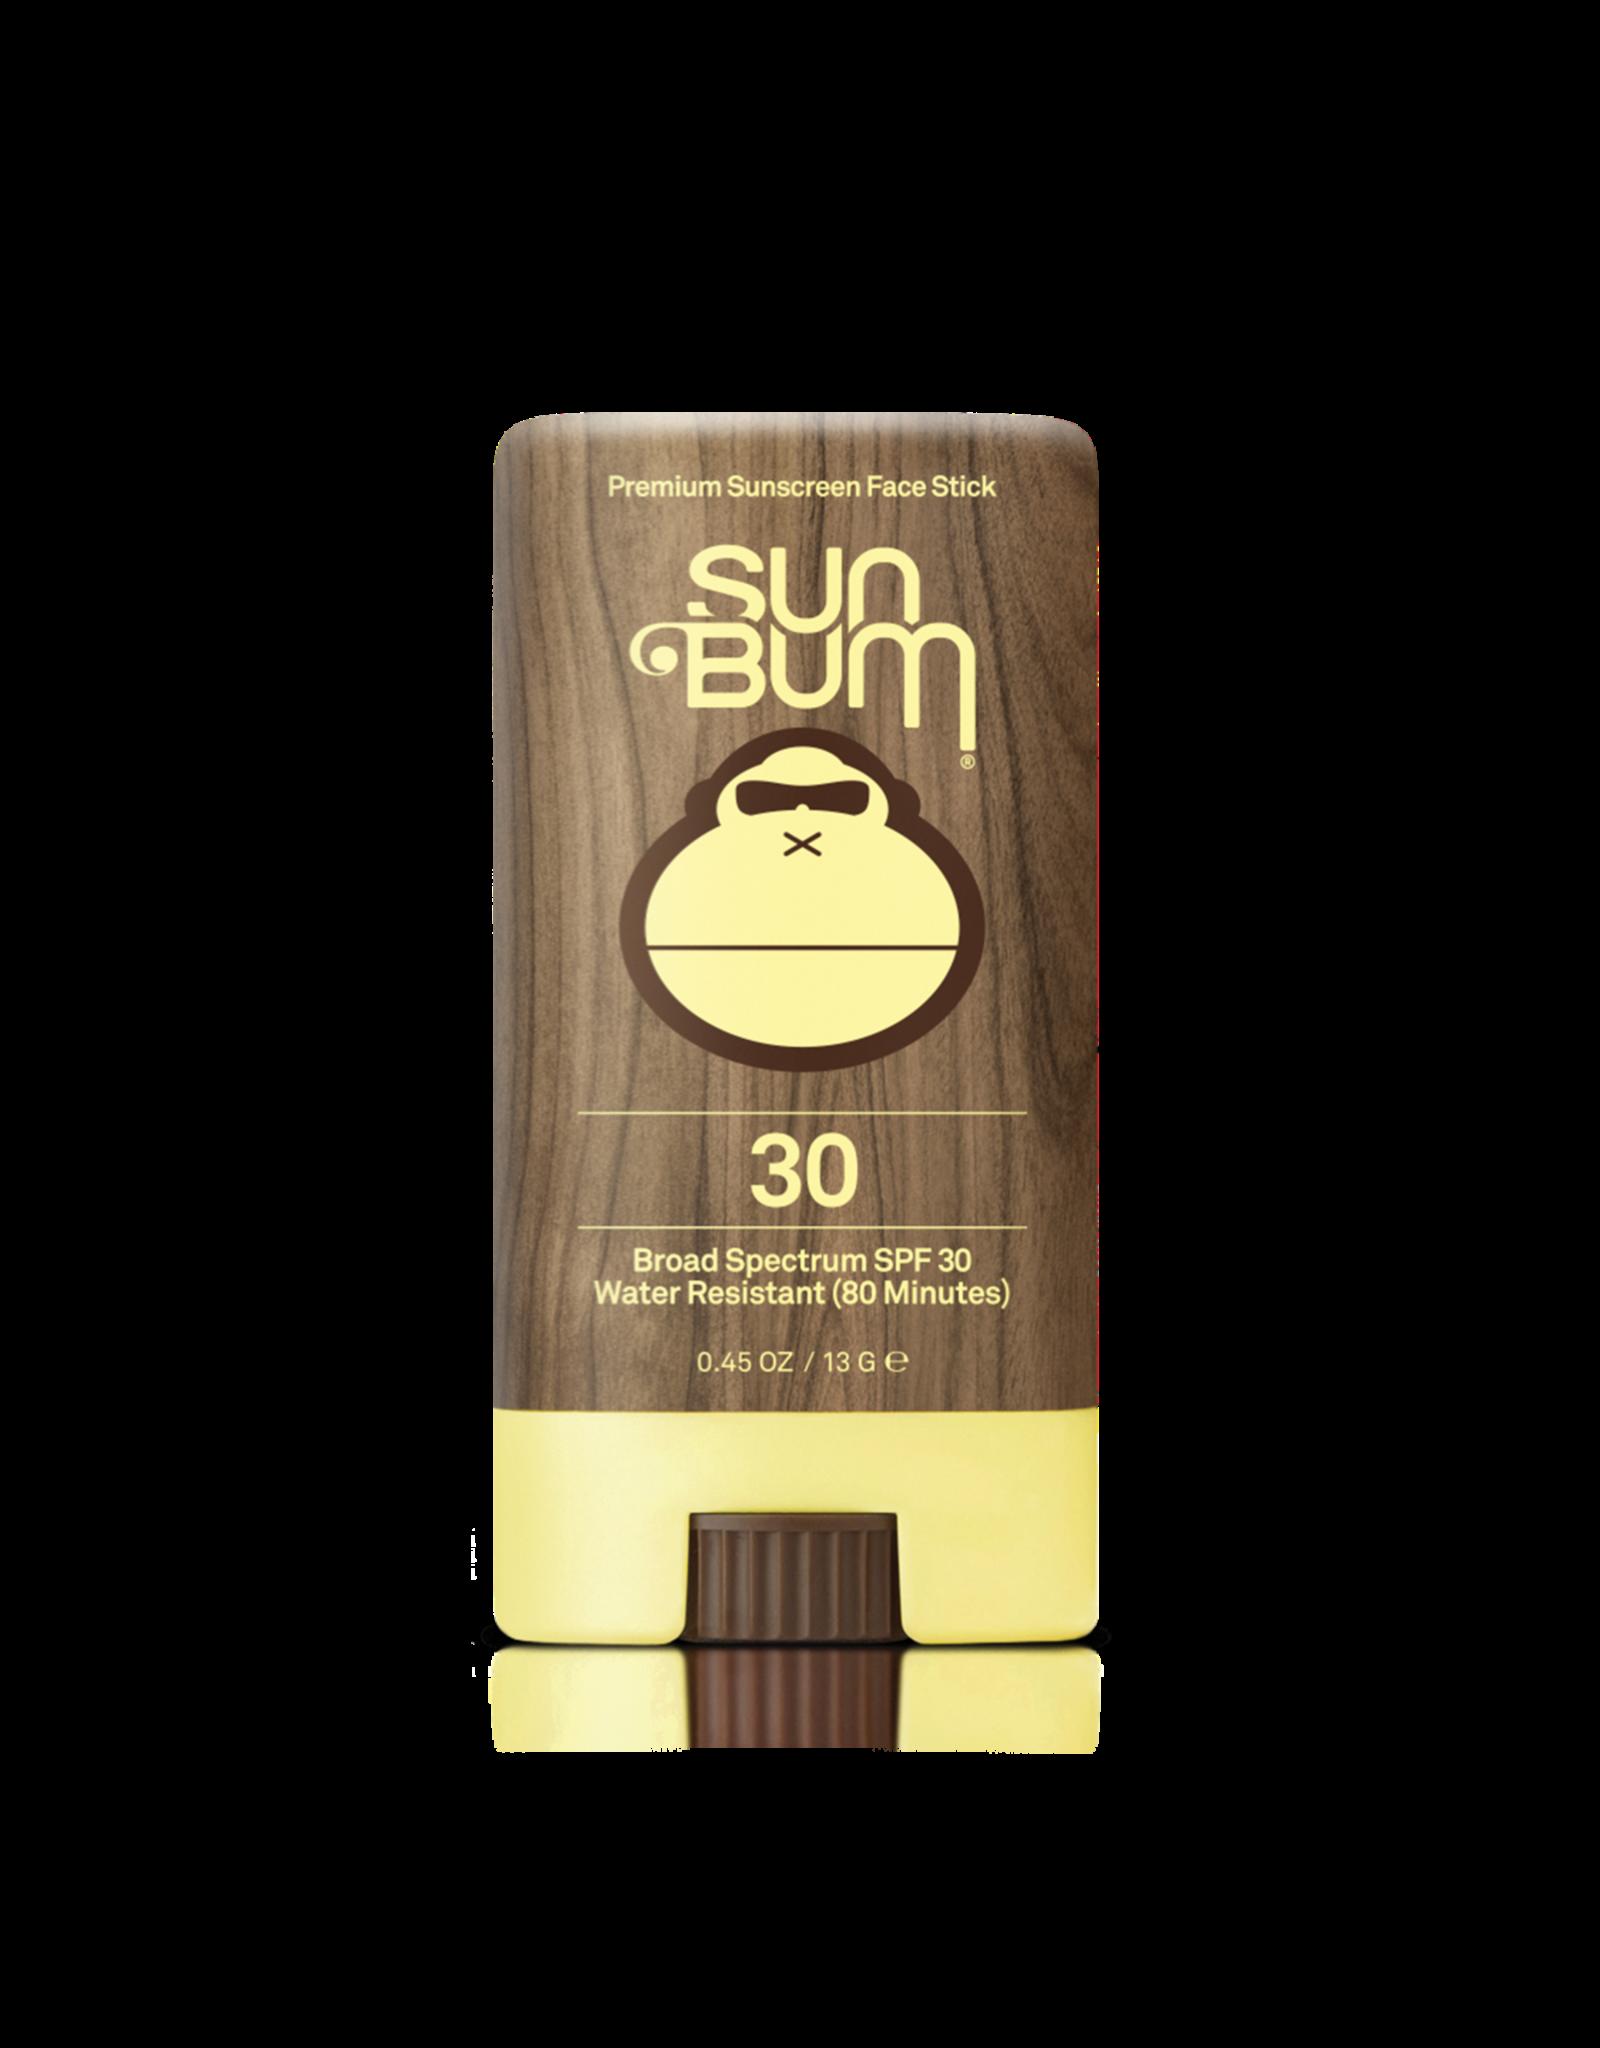 SUN BUM Face Stick SPF 30